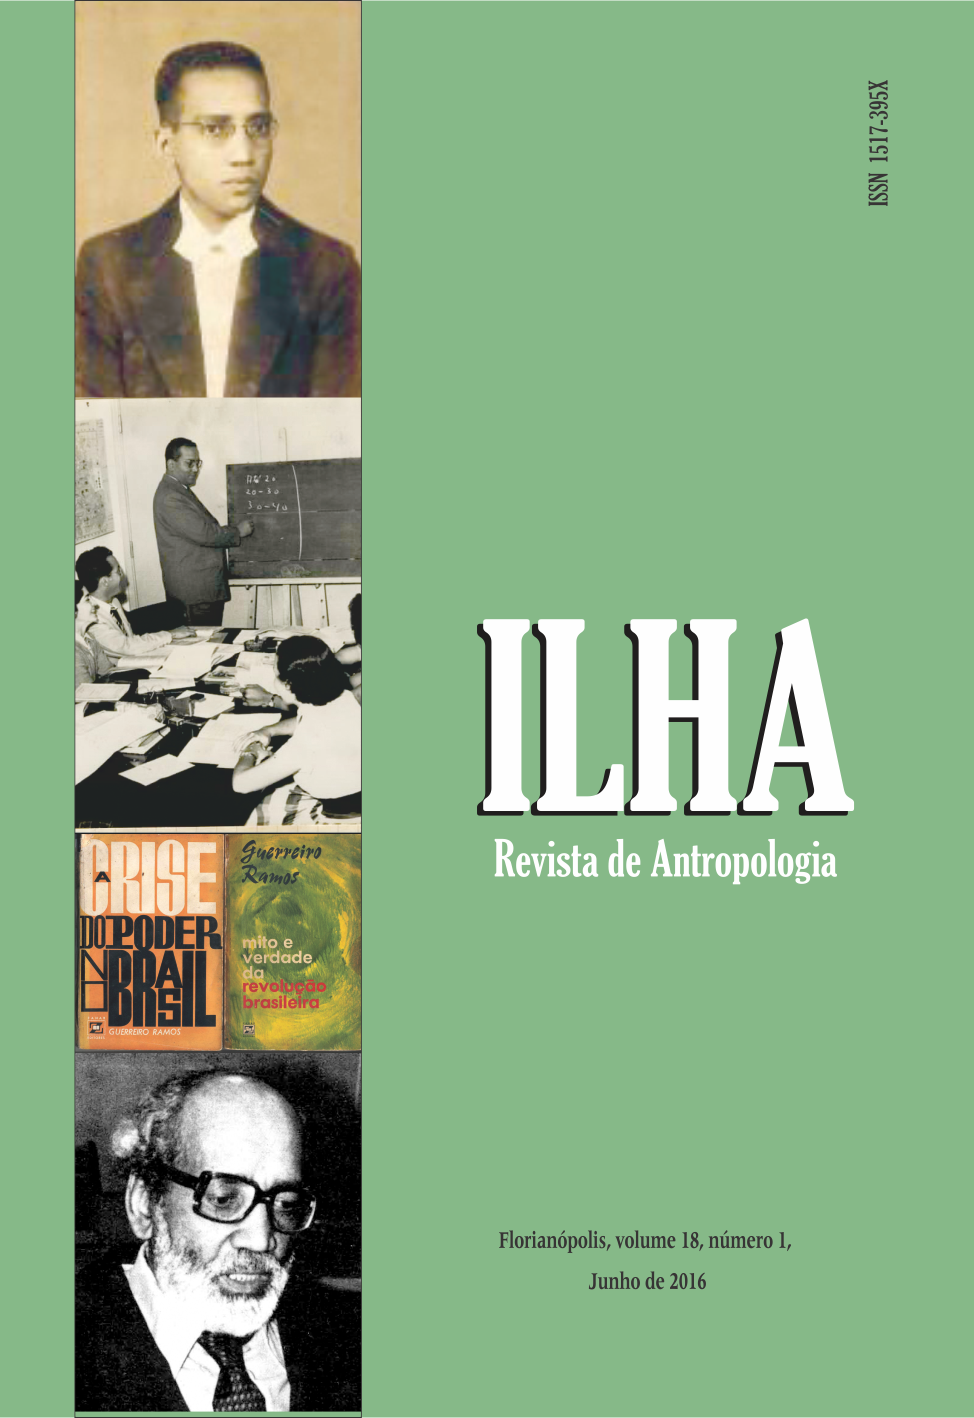 Editores do volume 18.1: Professora Doutora Ilka Boaventura Leite, e Professor Doutor Amurabi Oliveira